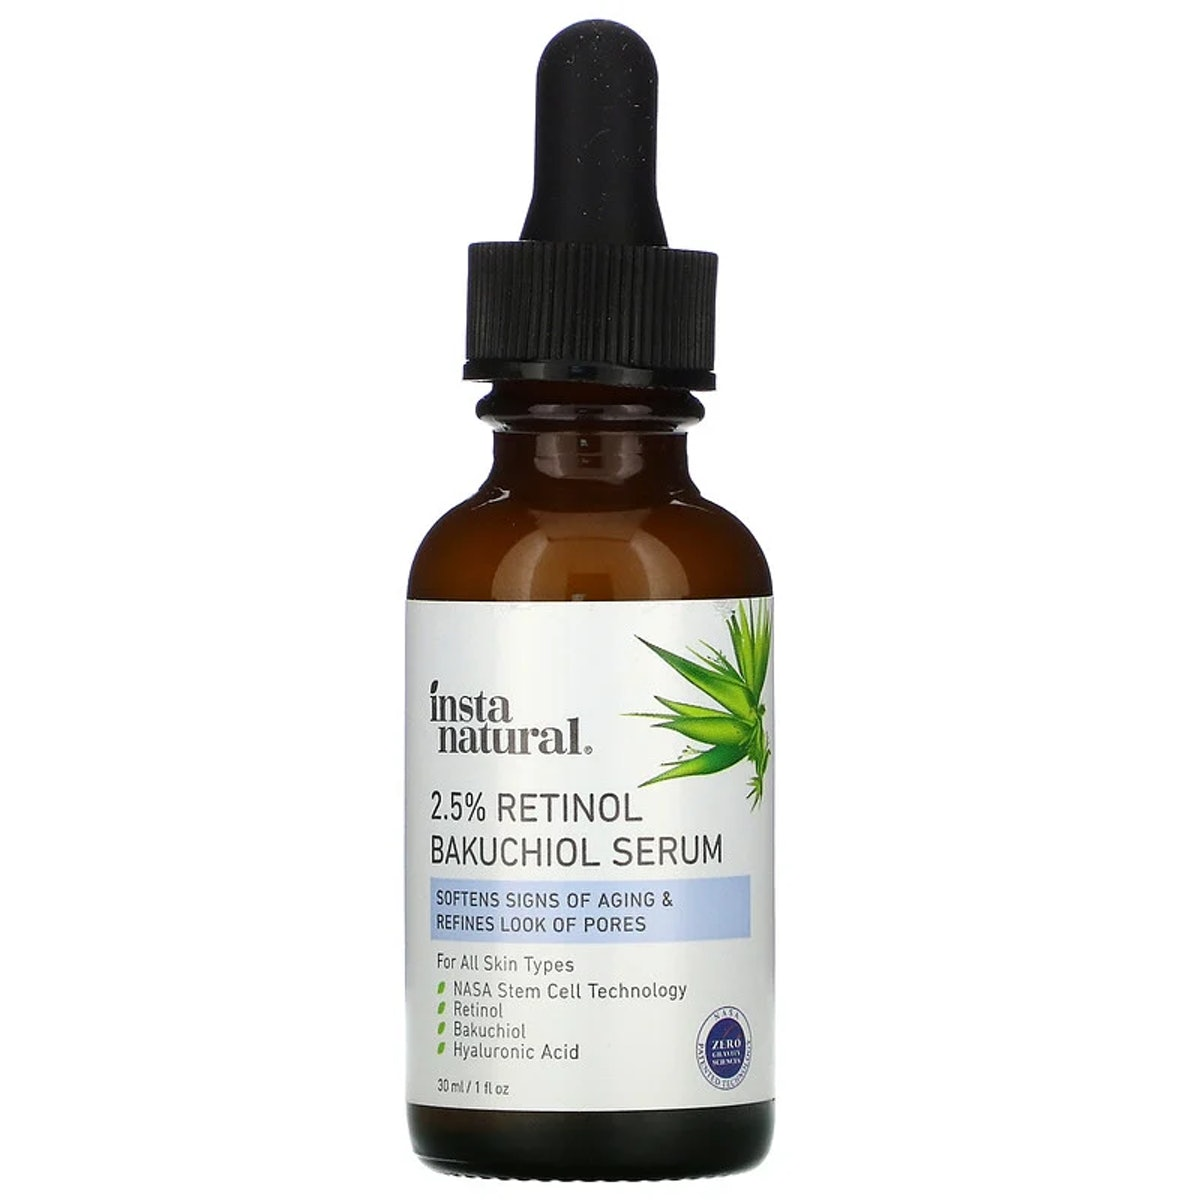 InstaNatural, 2.5% Retinol Bakuchiol Serum